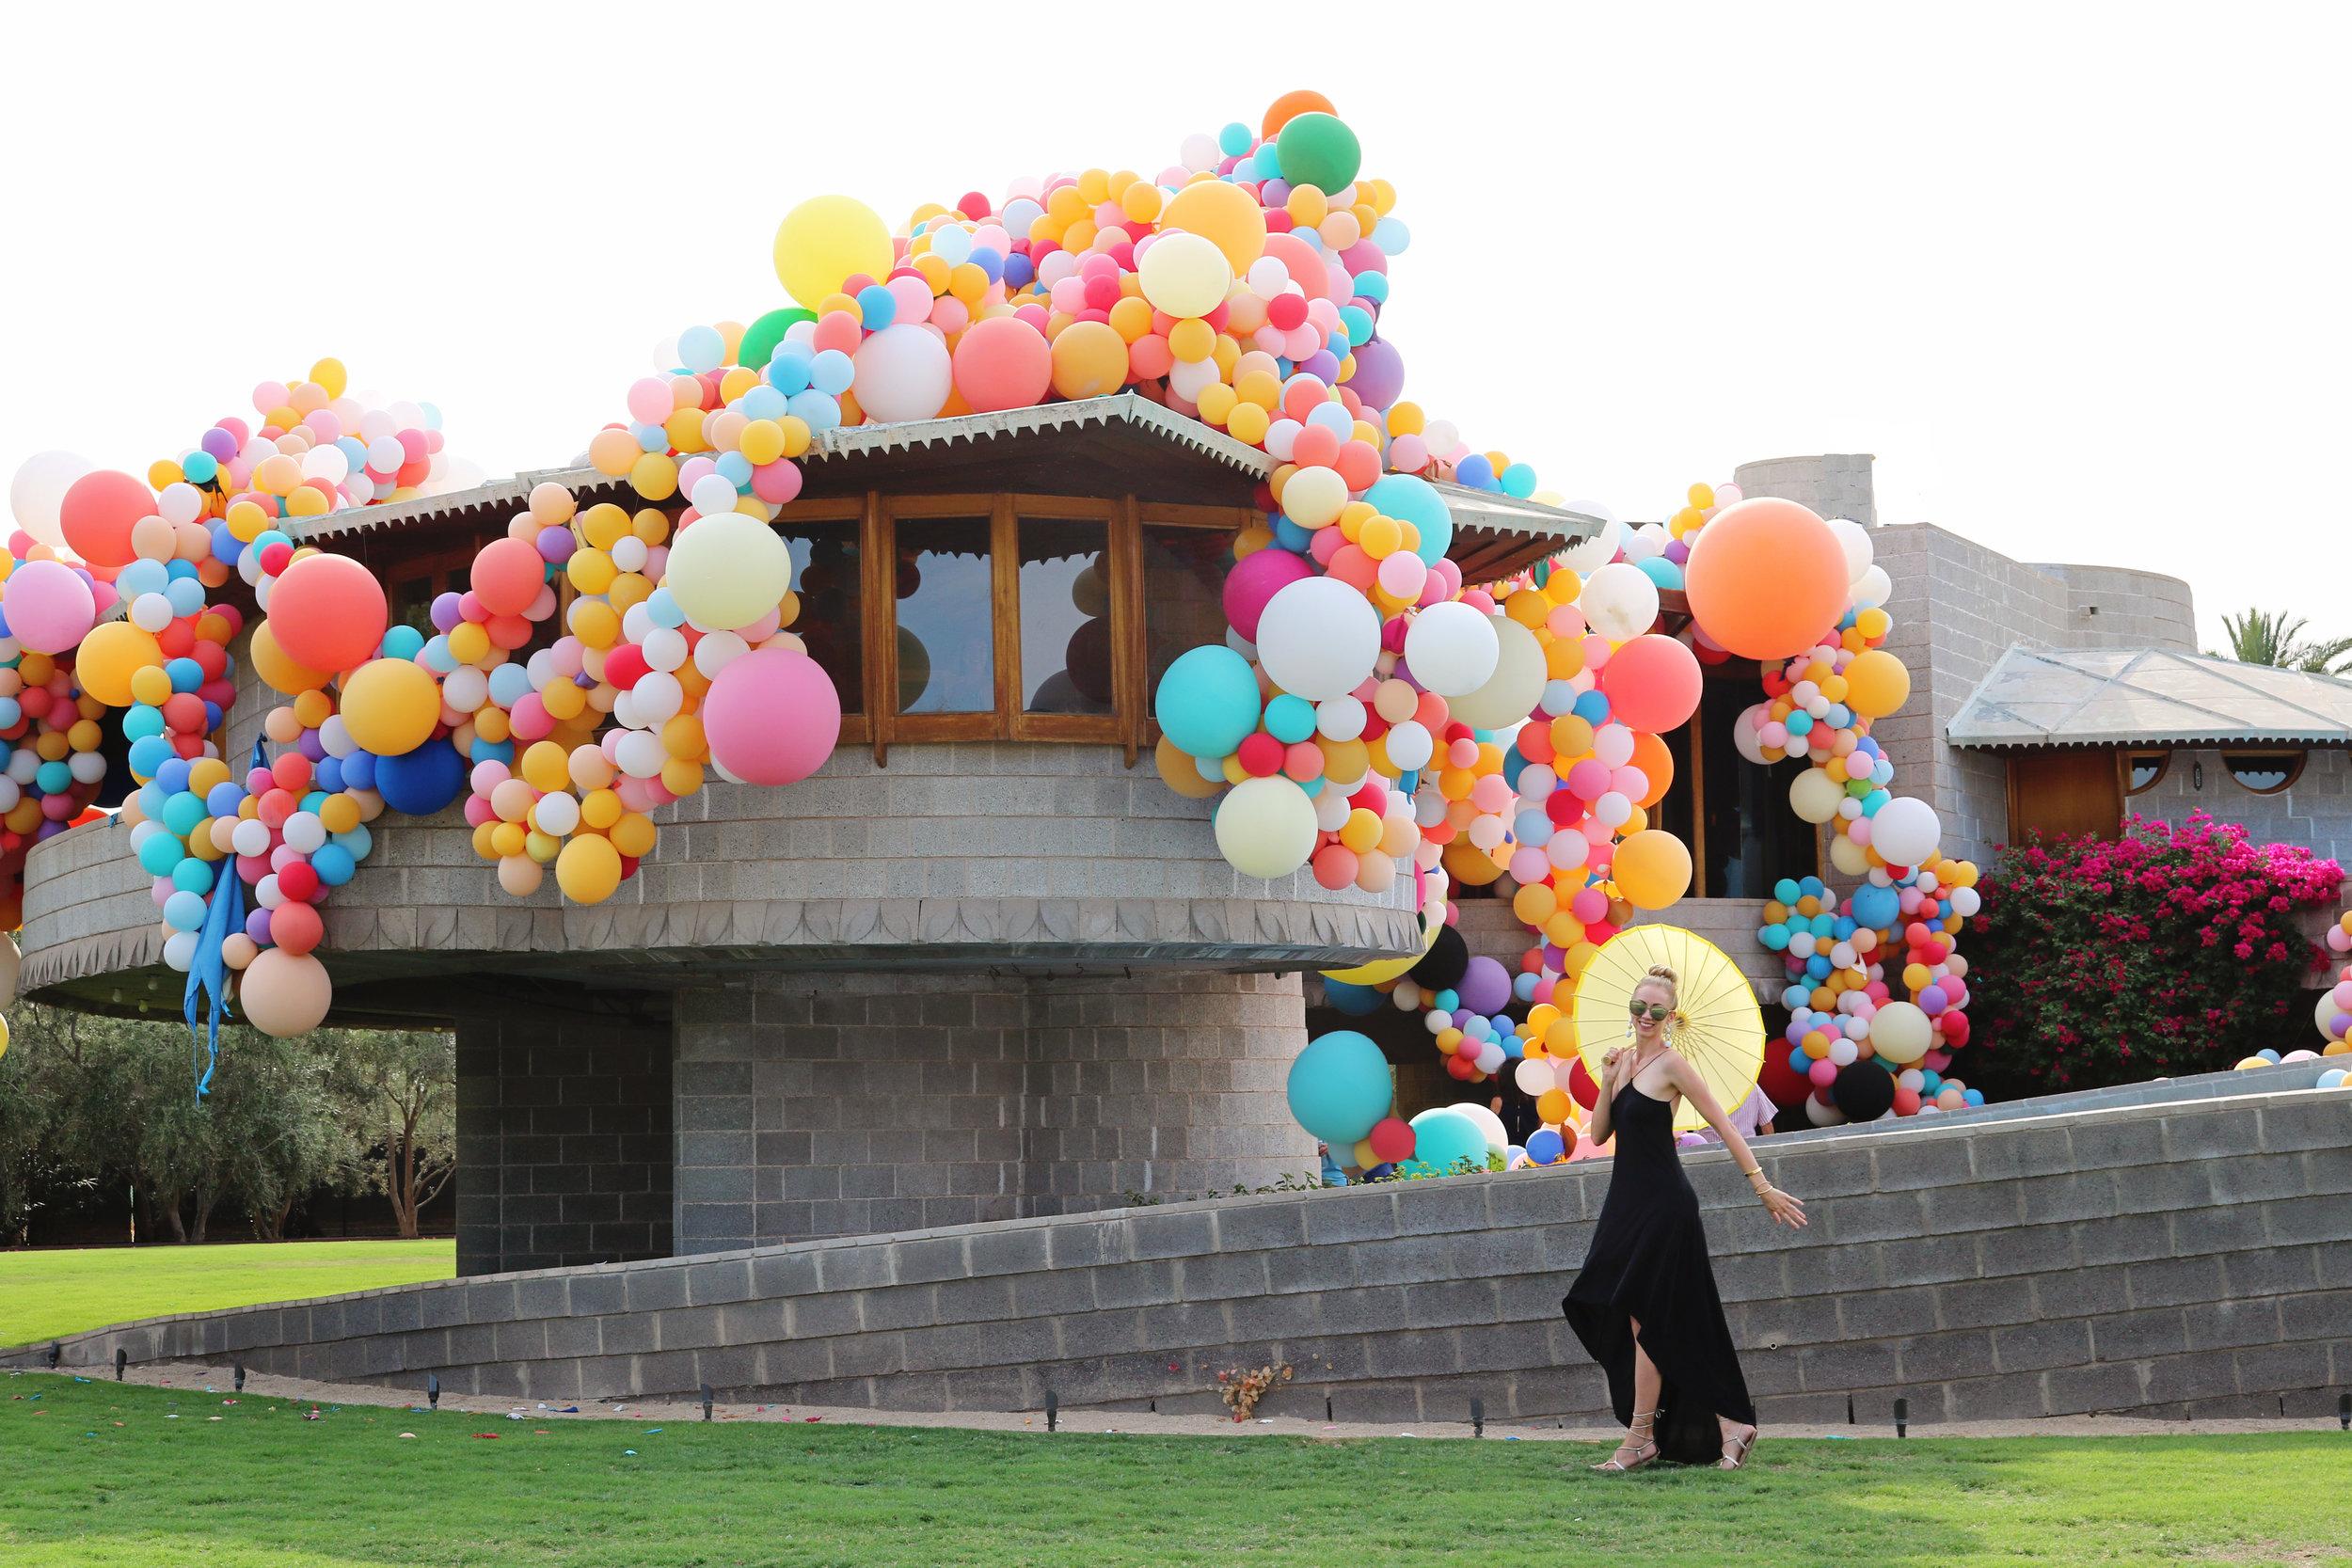 david-wright-house-balloons-anniversay-art-installation.jpg